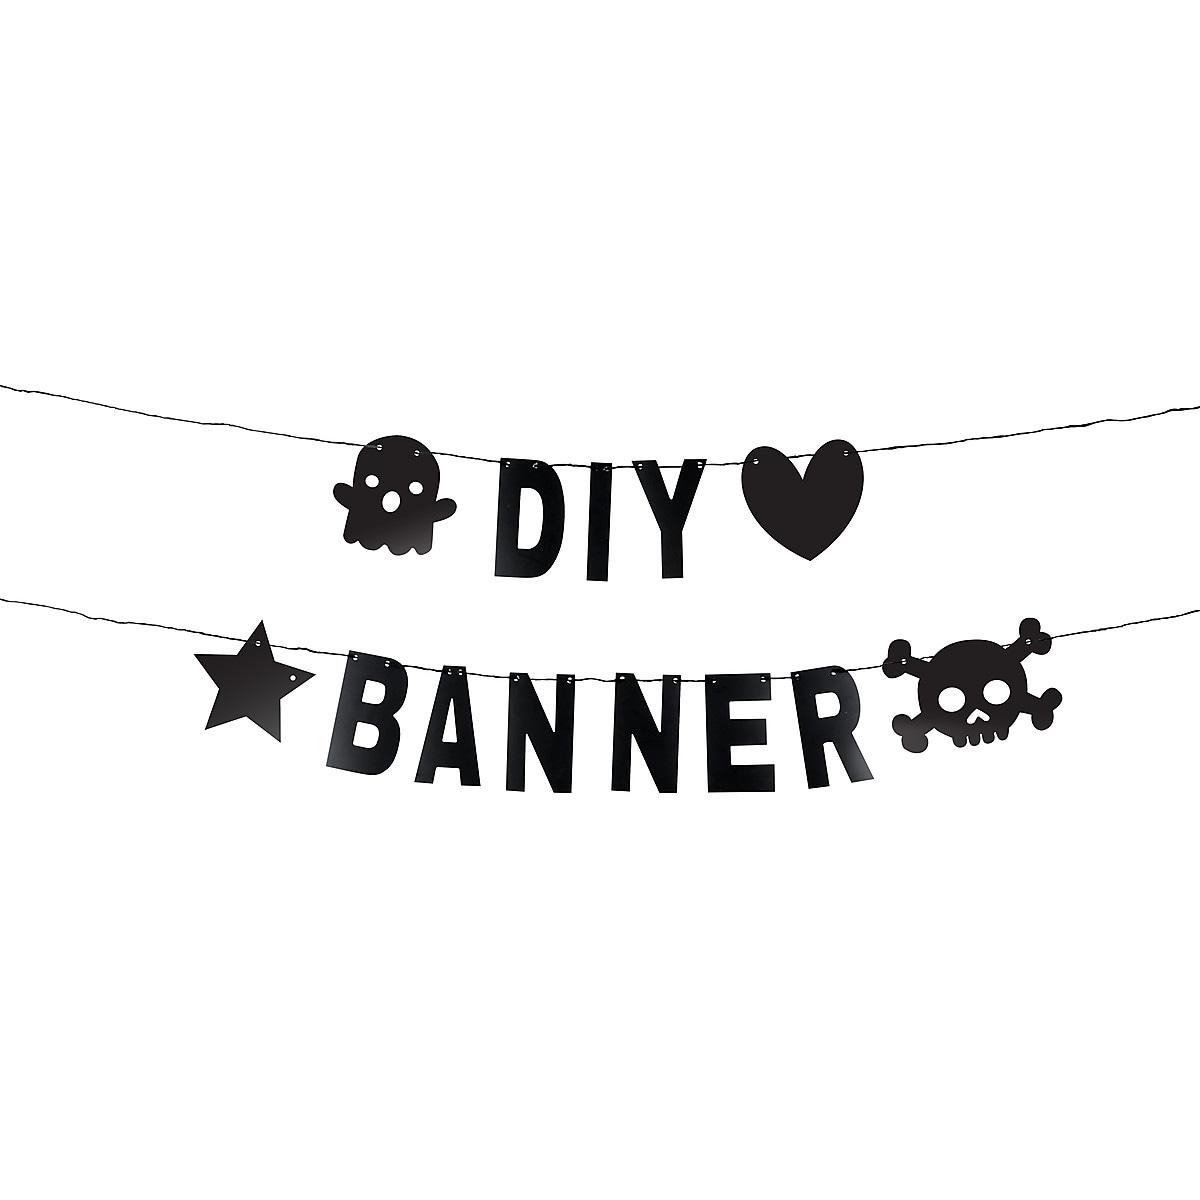 DIY Banner Kit, Black